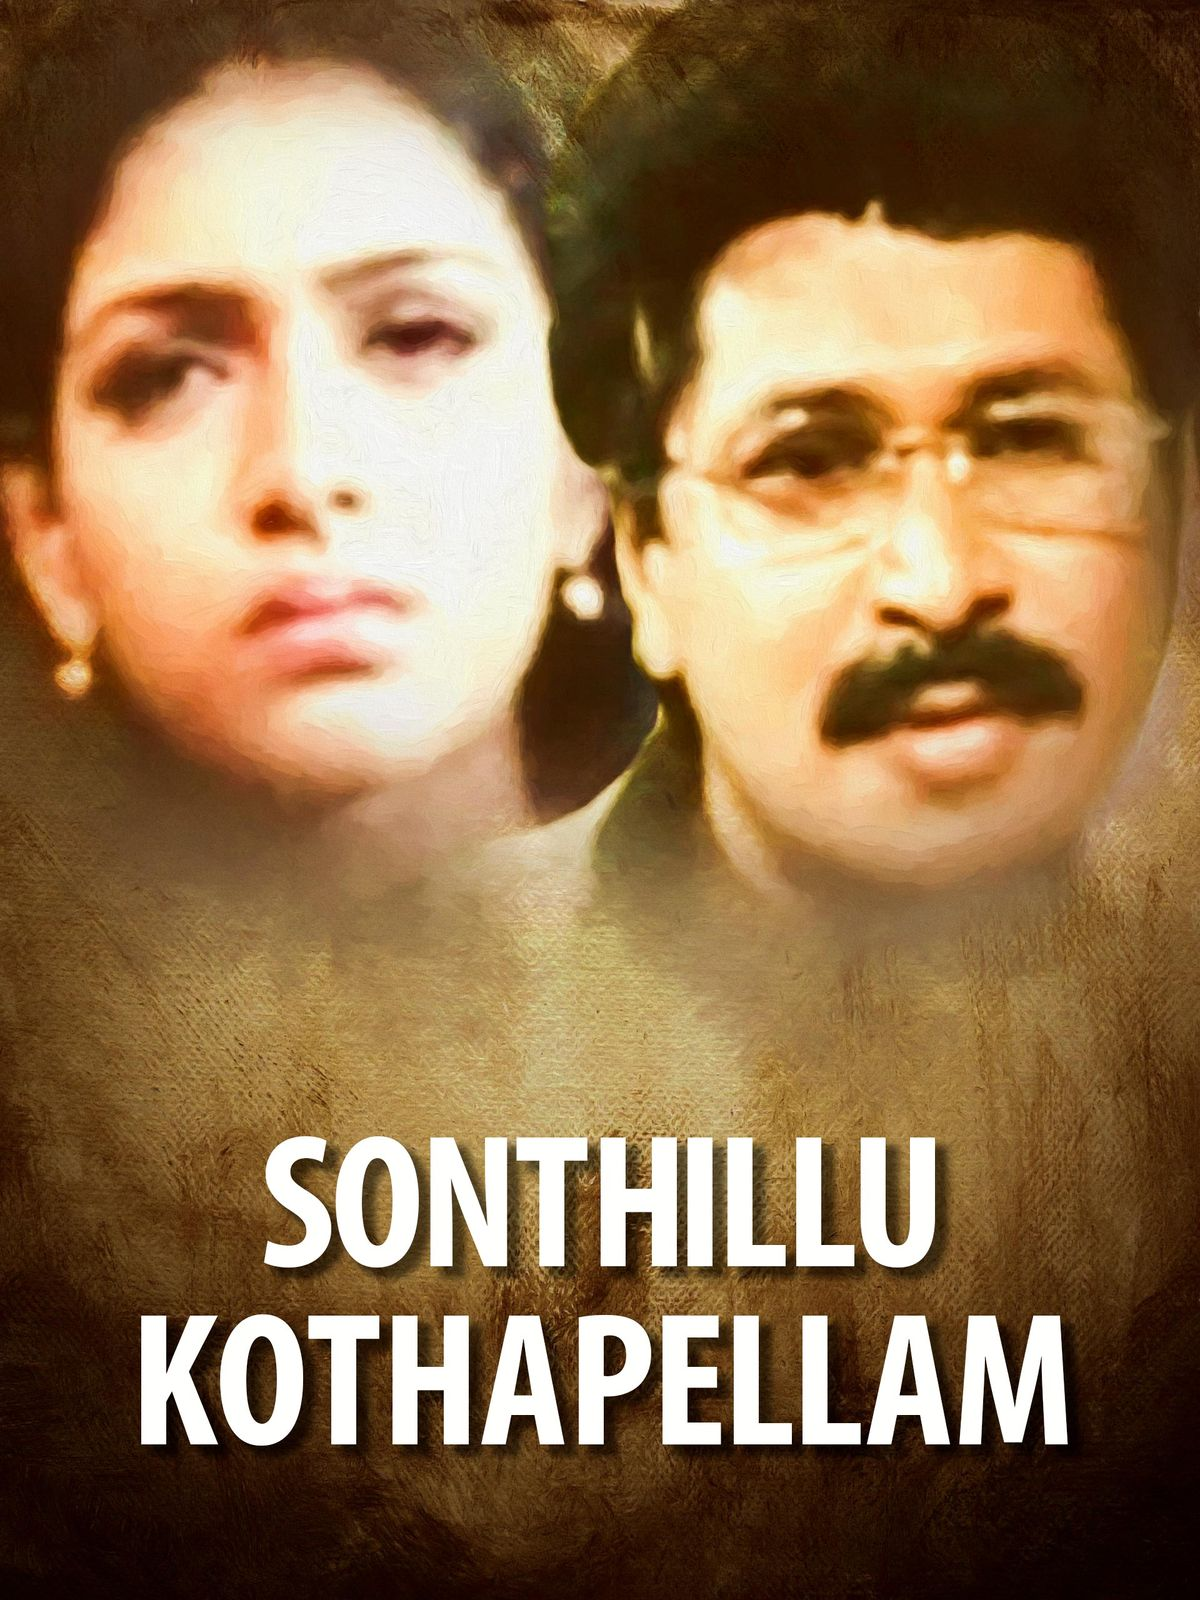 Sonthillu Kotha Pellam